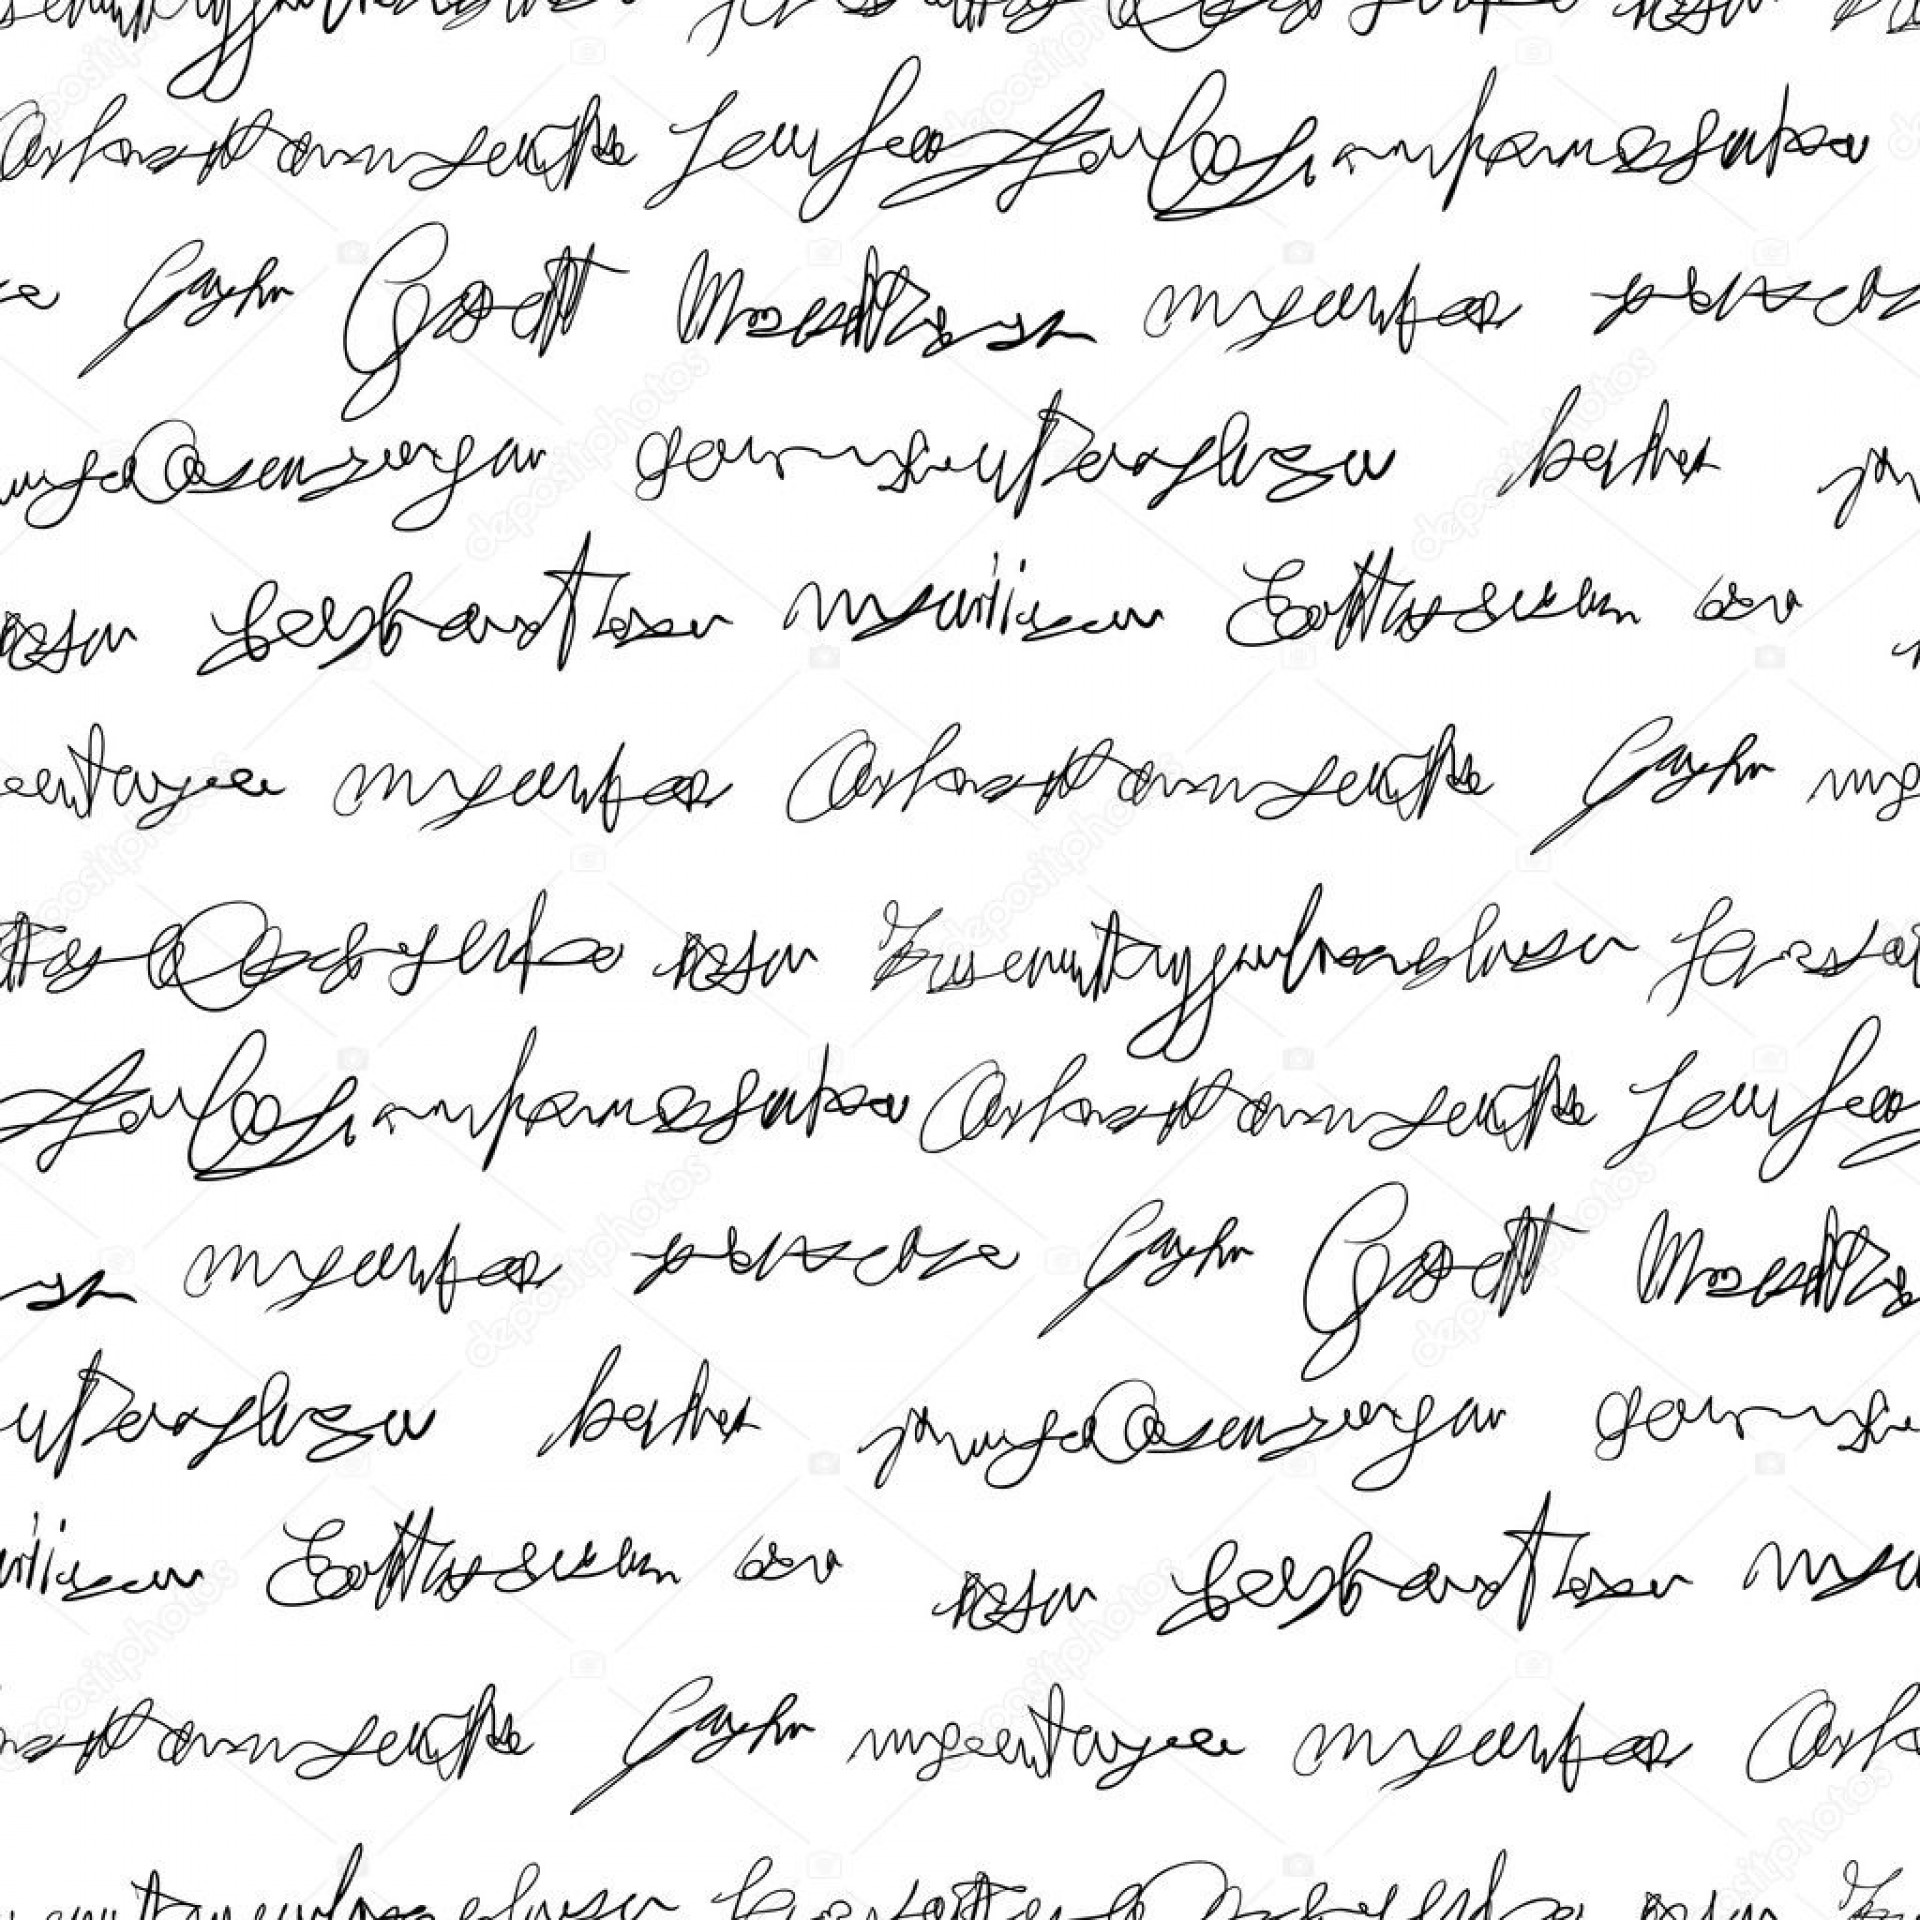 006 Essay Example Money Fake Writer Pixels Write Essays For Article Will Depositphotos 4972594 Seamless Writing Te Uk Jobs Best University High School Reddit 1920